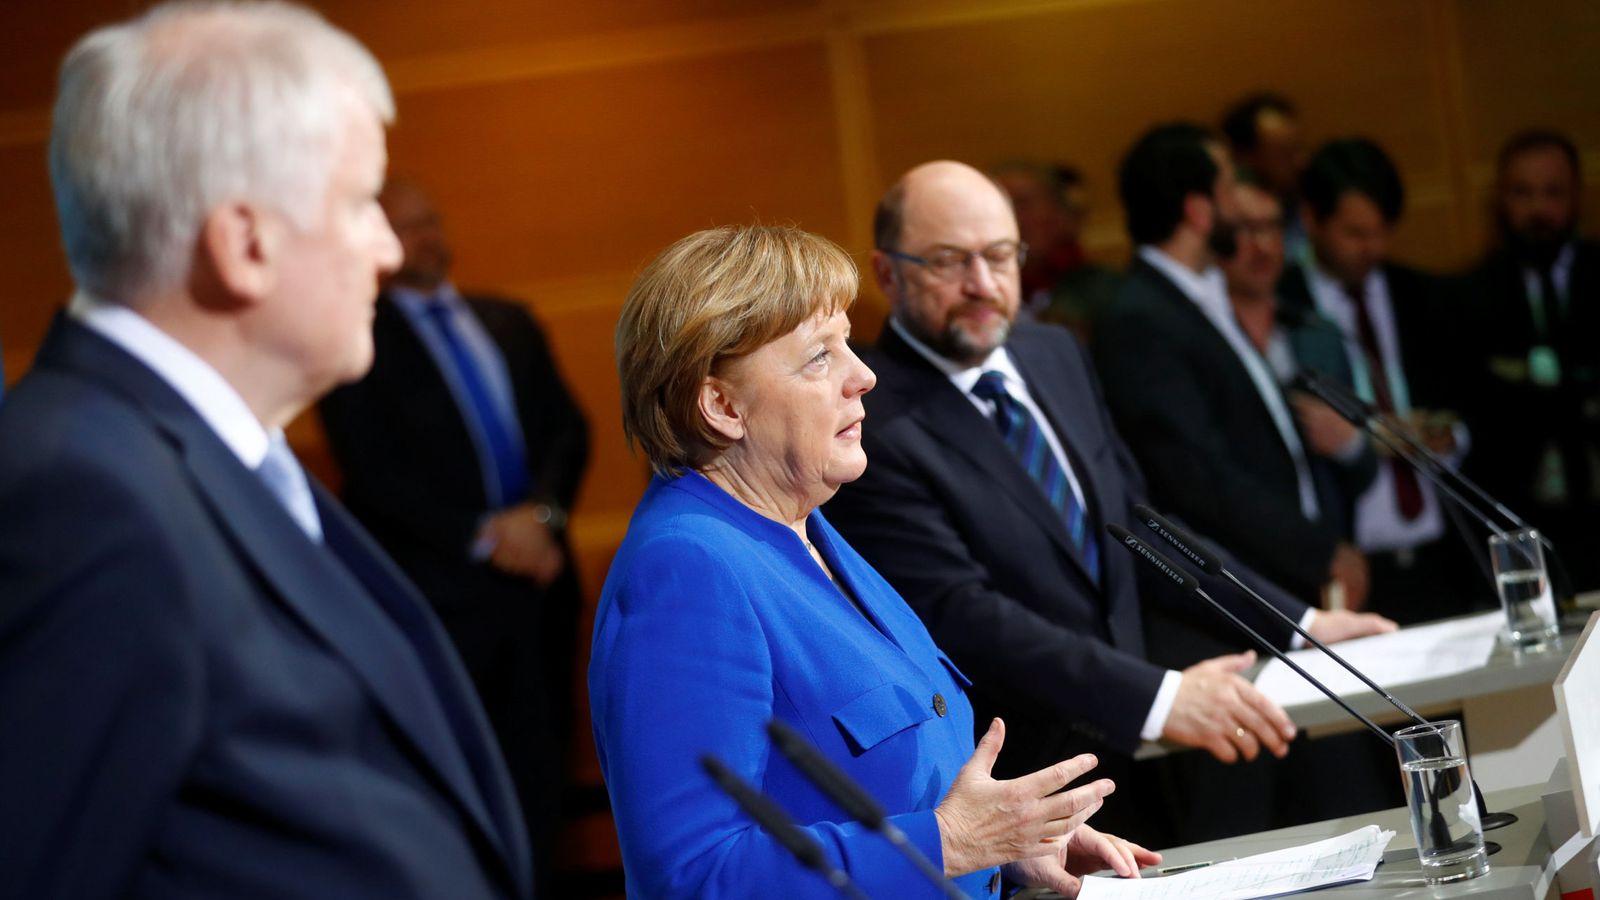 Foto: Angel Merkel, Martin Schulz y Horst Seehofer tras el acuerdo. (Reuters)